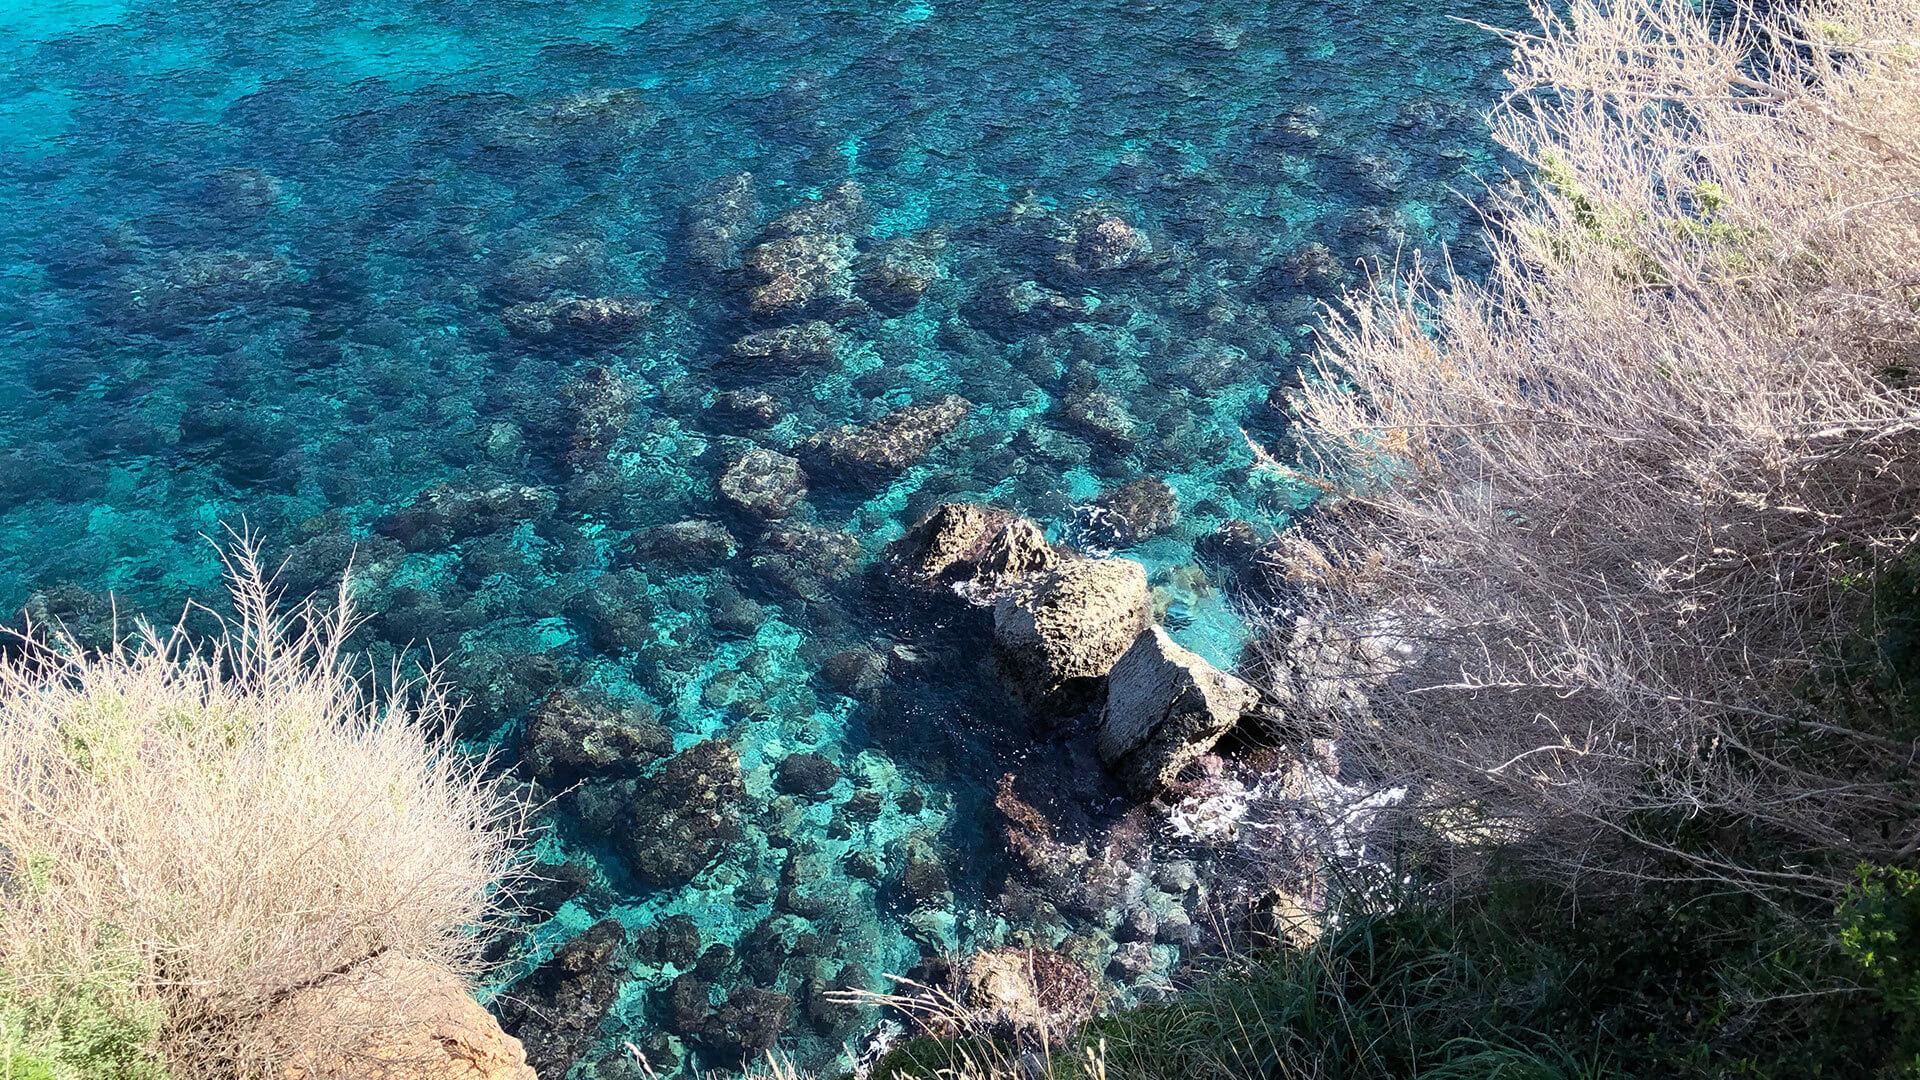 Turquoise water medditeranean Banyalbufar Mallorca Photo by Adele Chretien min